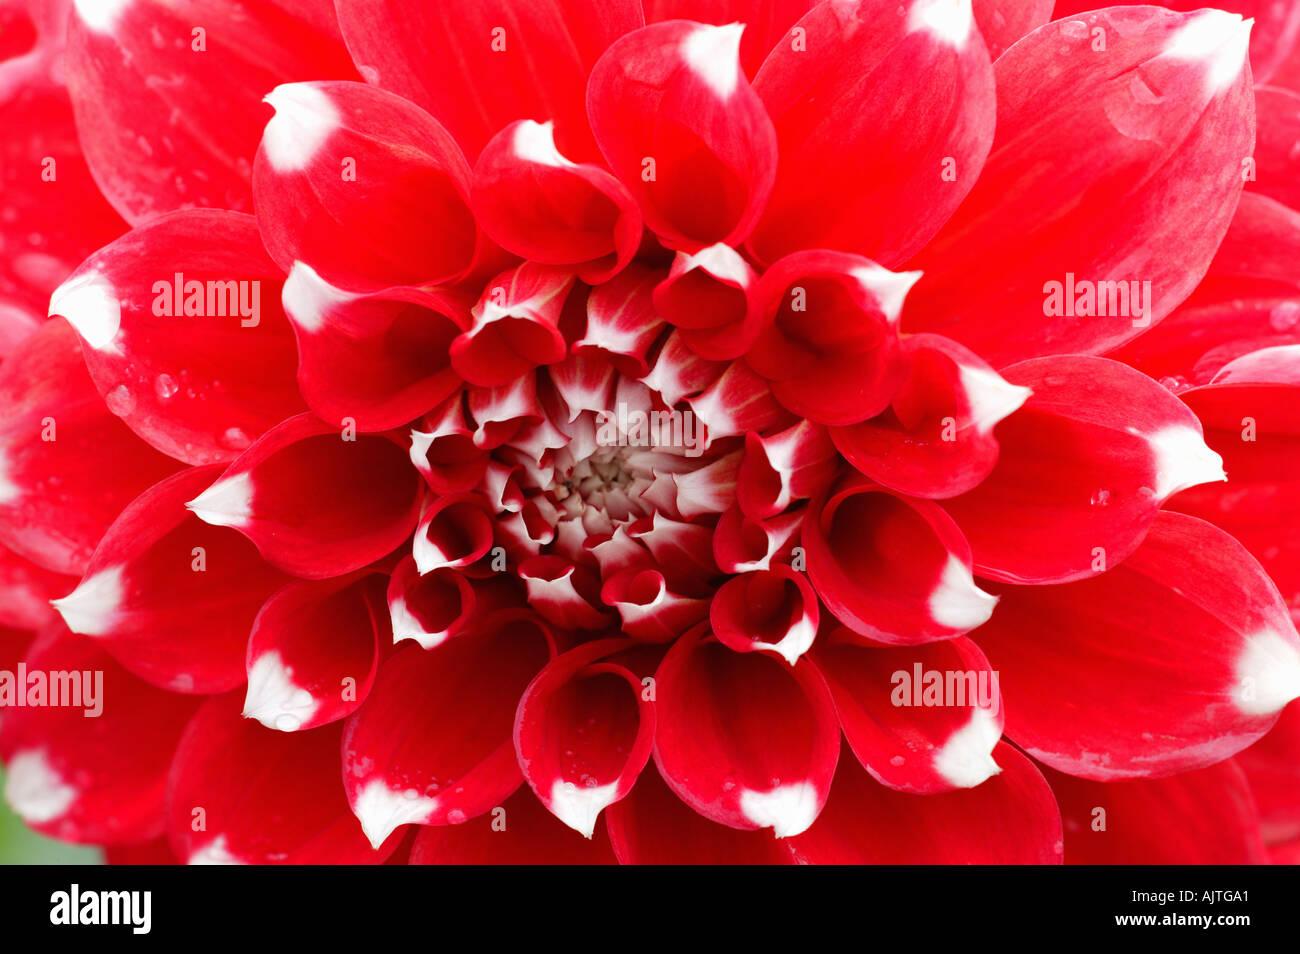 White flower red tips stock photos white flower red tips stock dahlia stevie d in close up stock image mightylinksfo